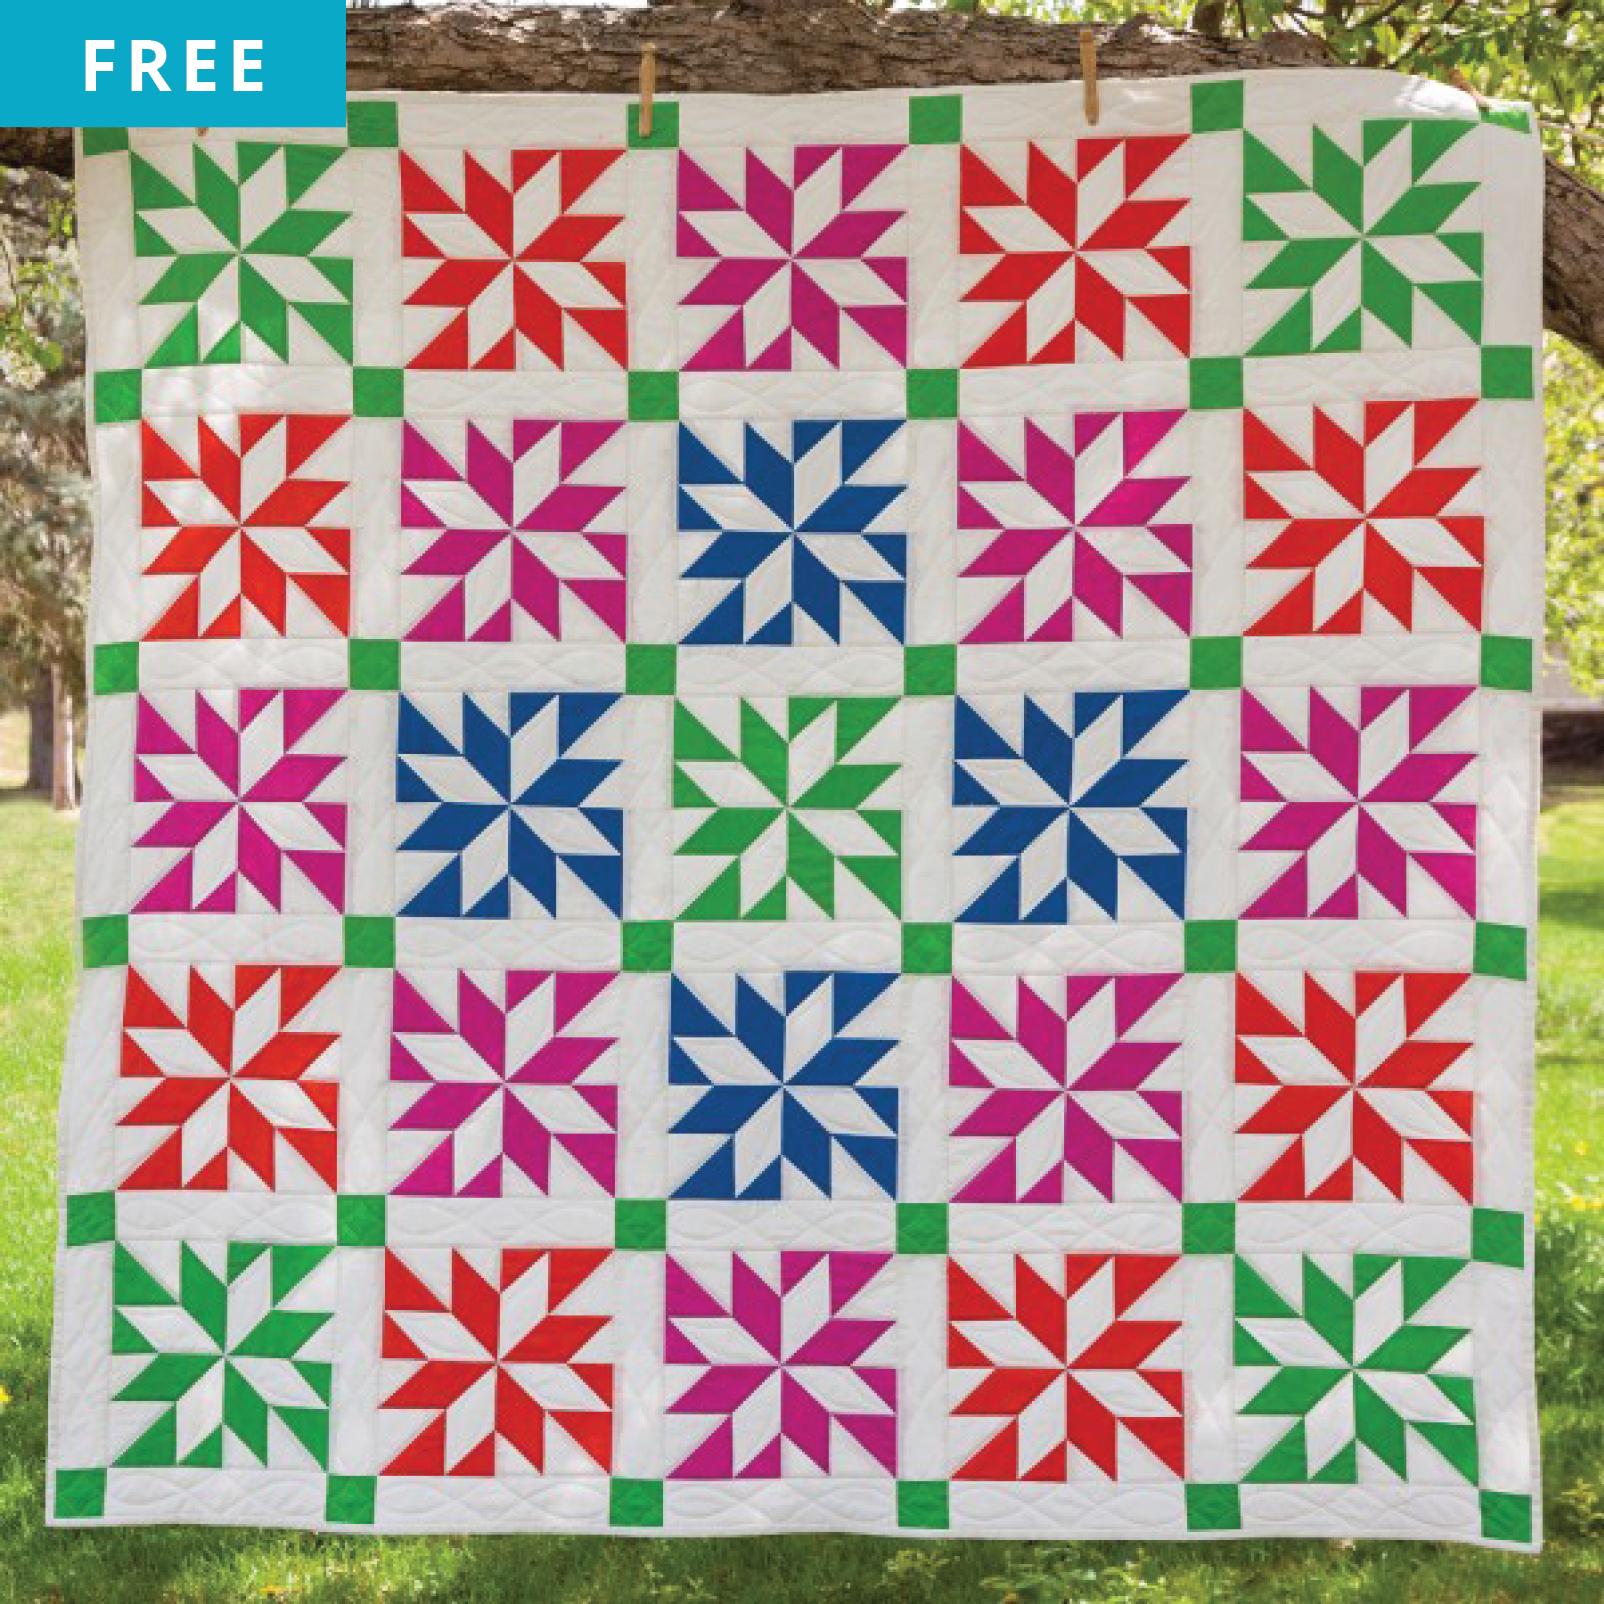 Free Quilt Pattern - LeMoyne Star Prism Quilt